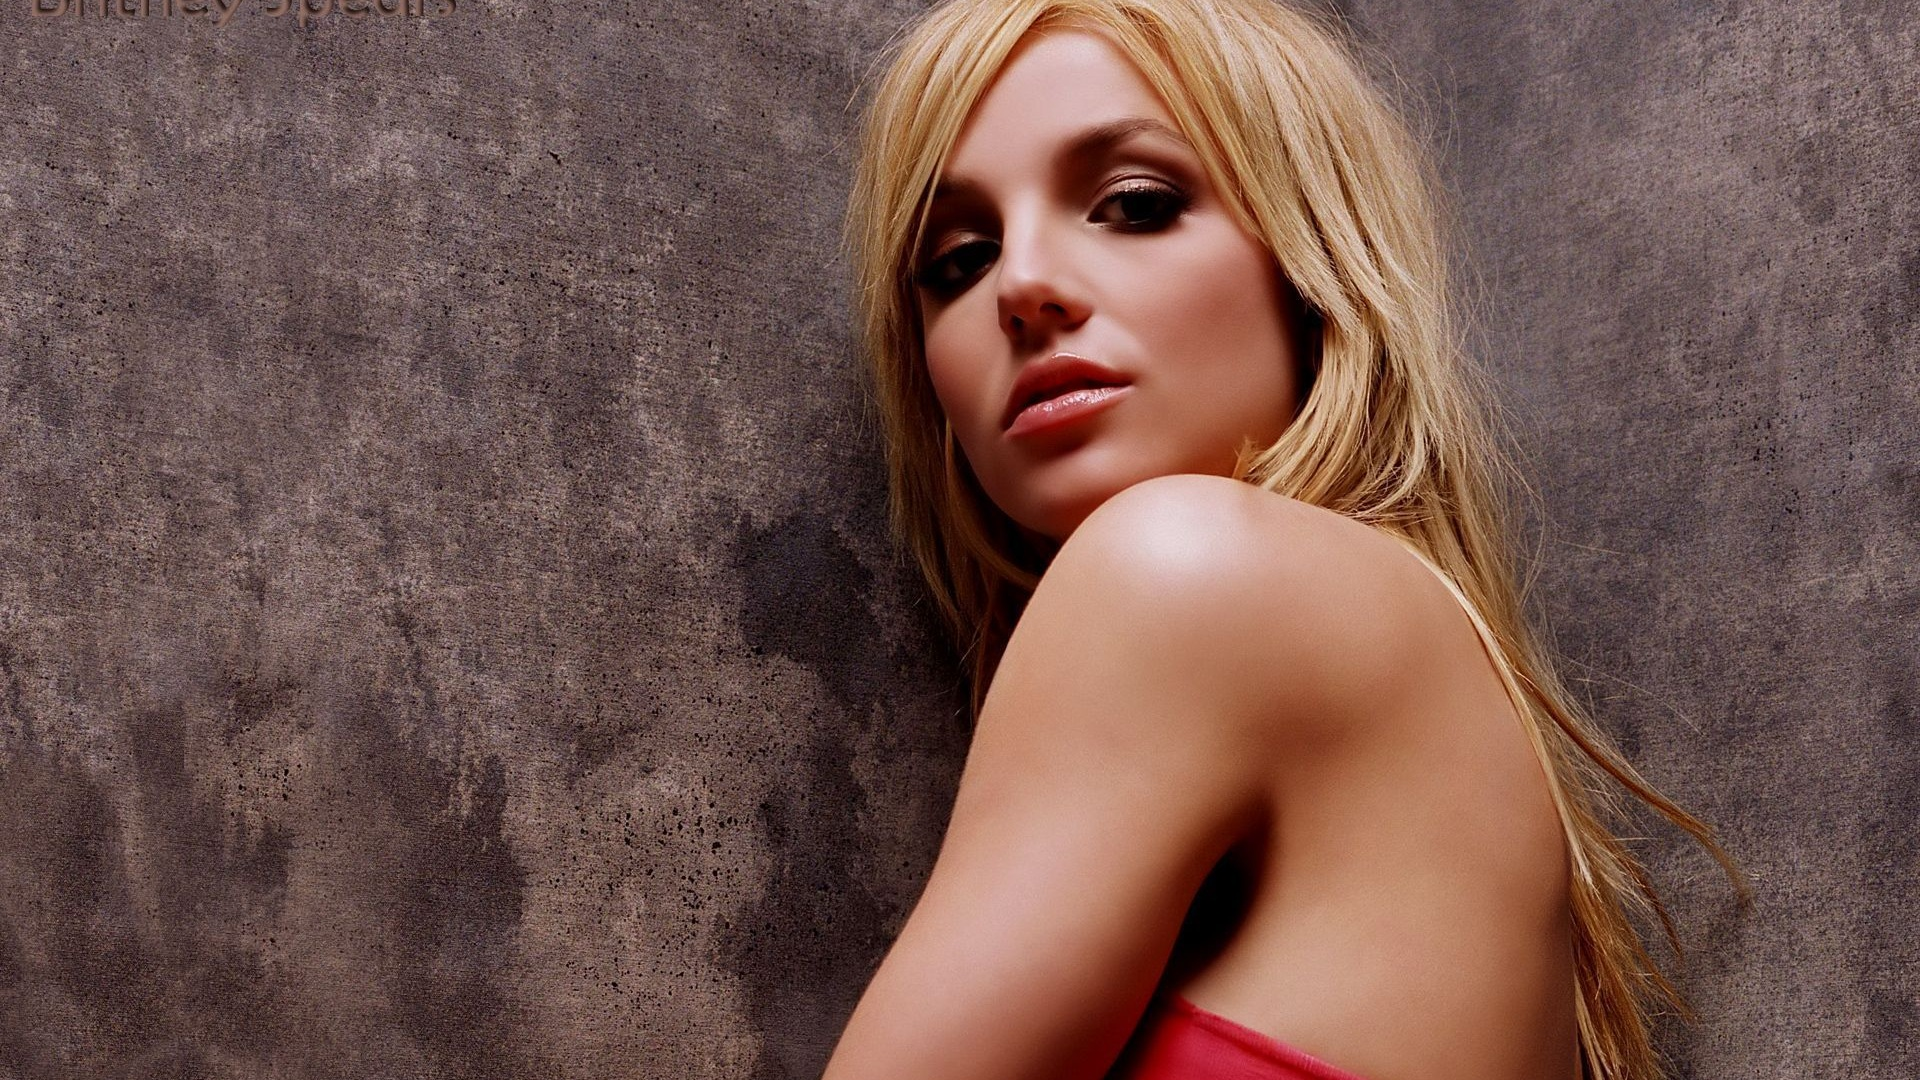 Britney-Spears-01_1920...